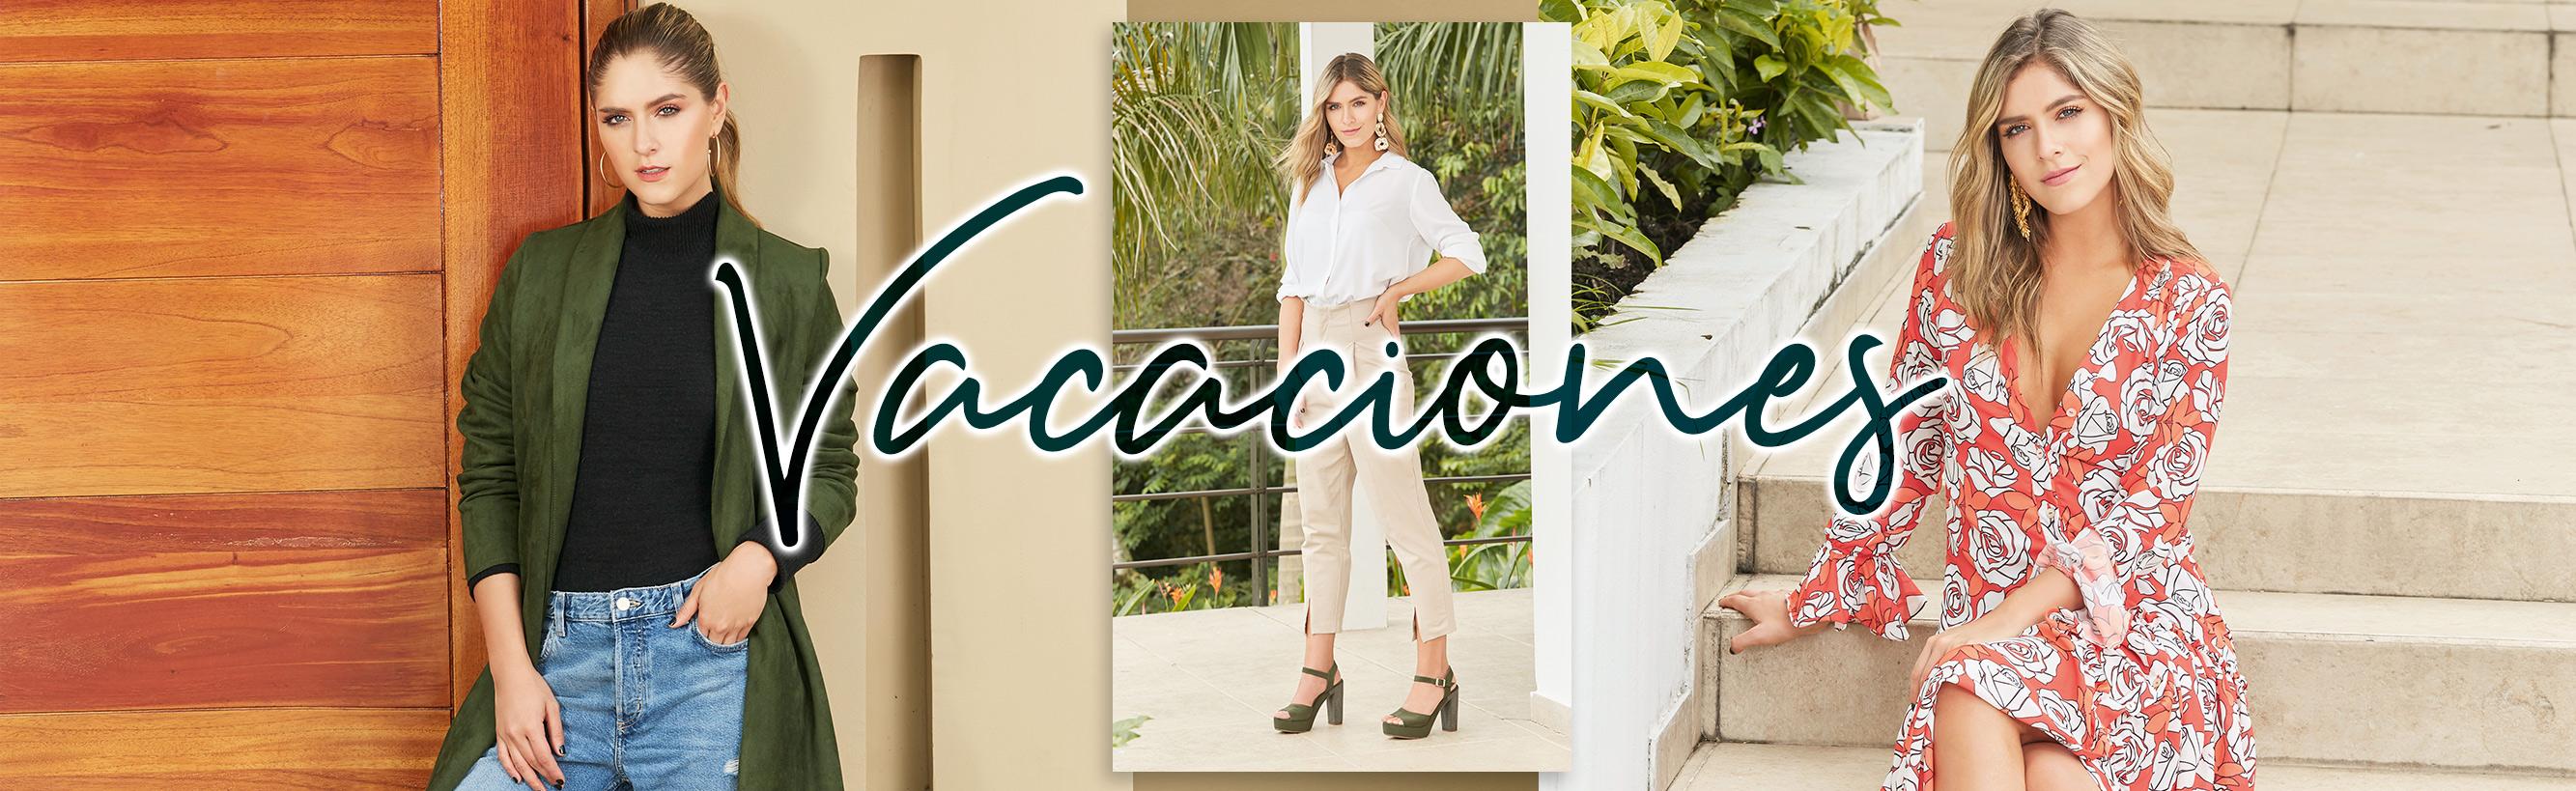 catalogo aquarella 2019 vacaciones